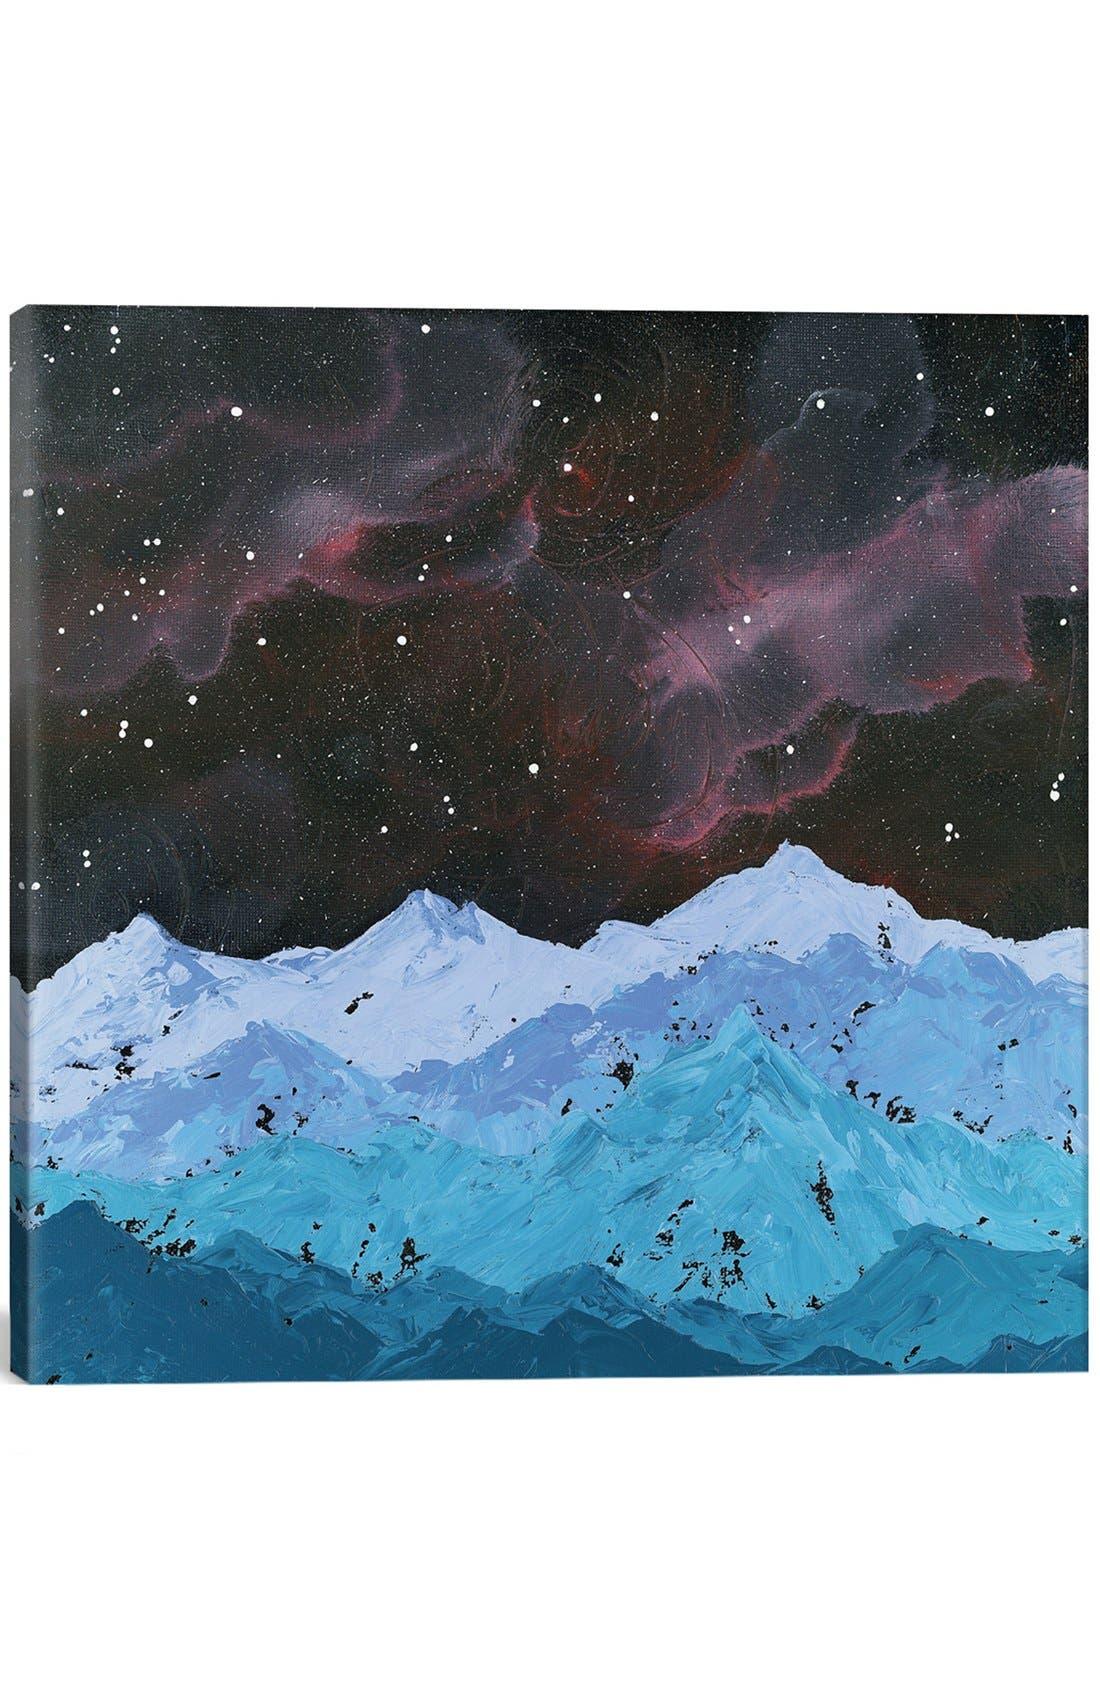 Alternate Image 1 Selected - iCanvas 'Space Mountains' Giclée Print Canvas Art